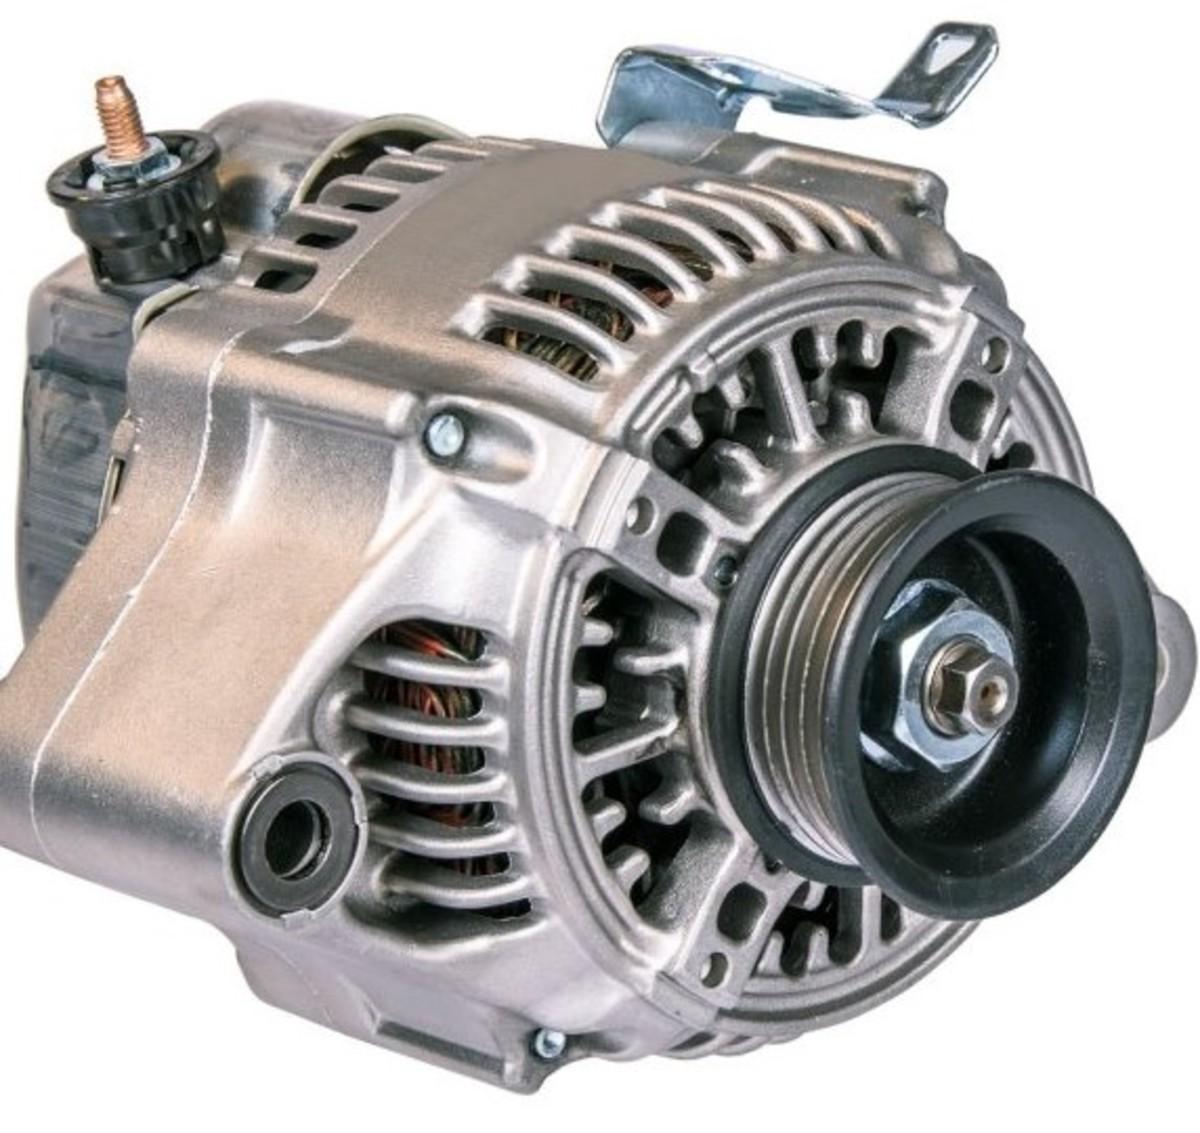 Alternator Replacement Video: V6 Camry, Avalon, Solara, Highlander and Lexus ES300 (3.0 - 3.3L MZFE Engine Type)